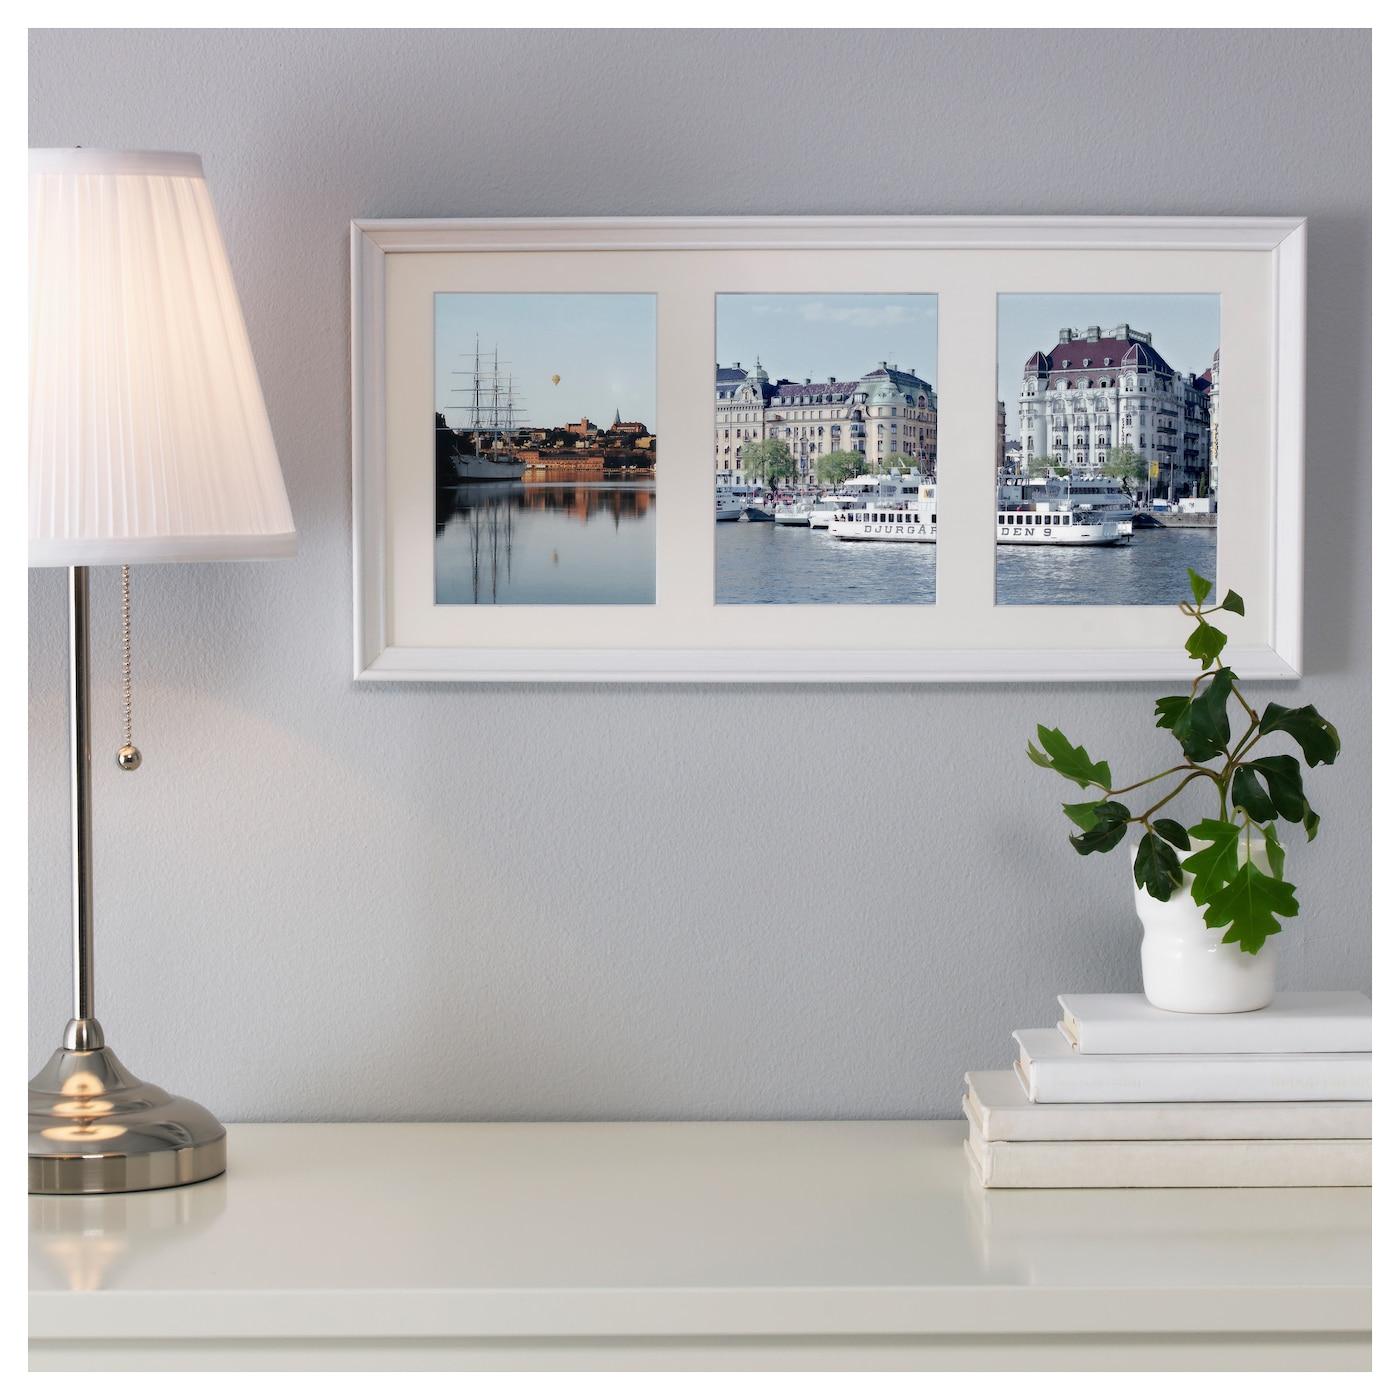 knopp ng cadre pour 3 photos teint blanc 50x23 cm ikea. Black Bedroom Furniture Sets. Home Design Ideas